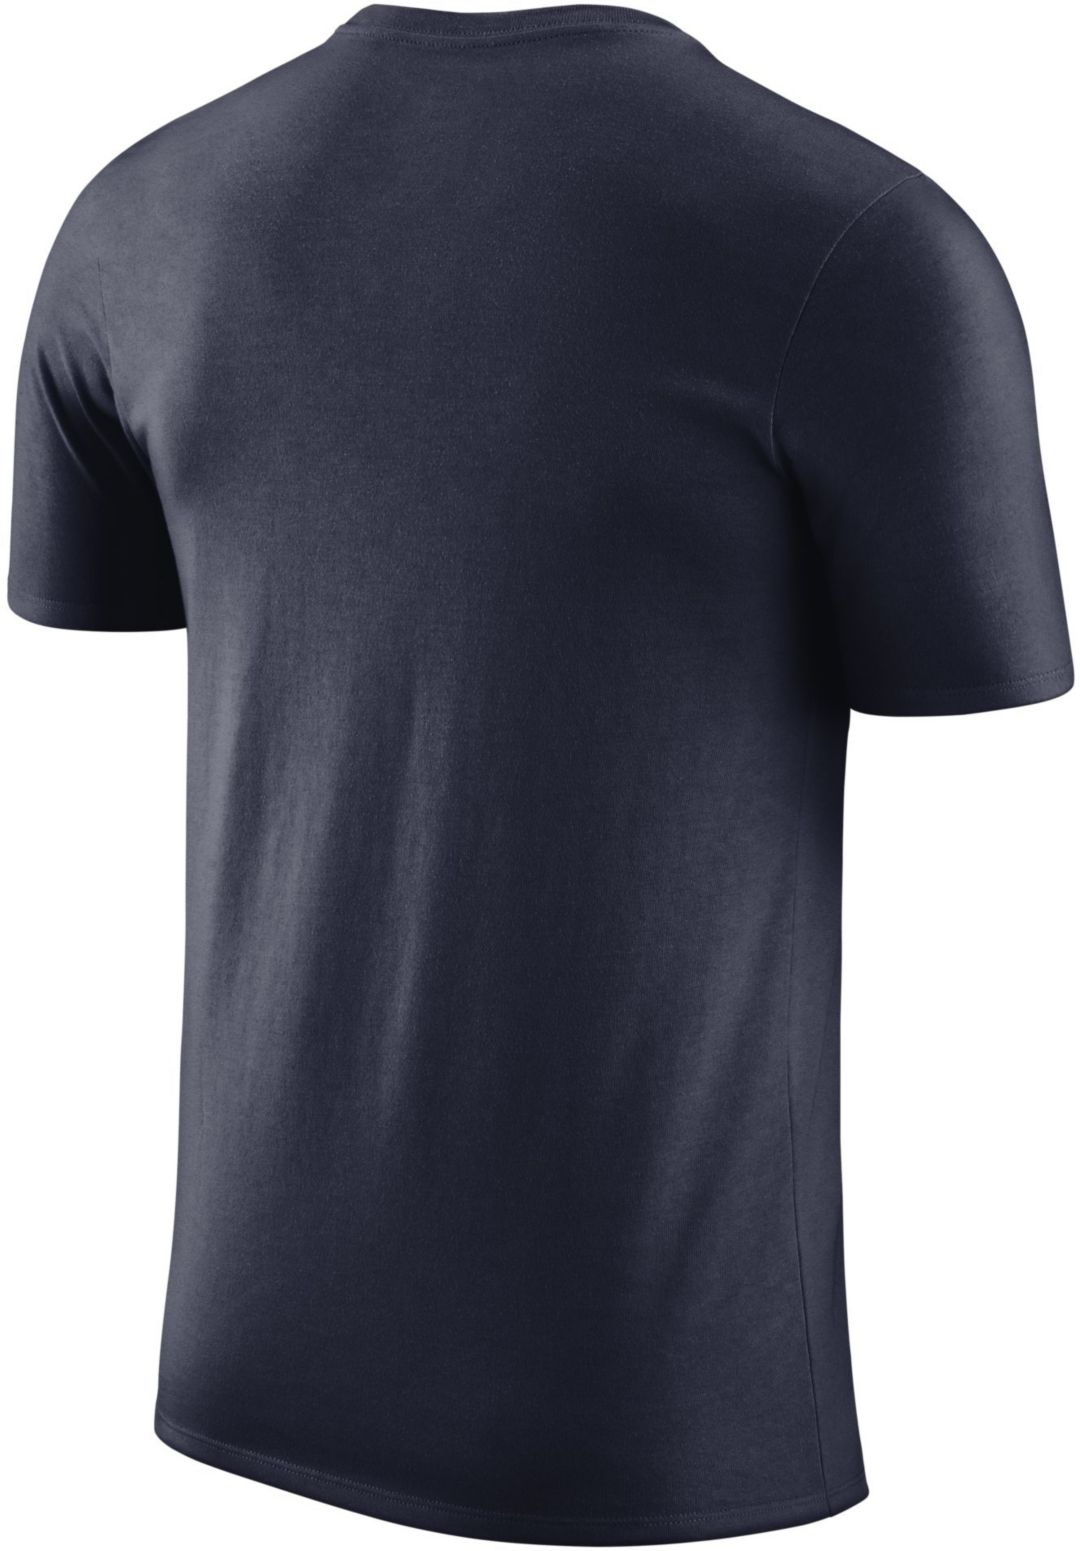 the latest ab62c 99d7b Nike Men's New York Yankees Practice T-Shirt